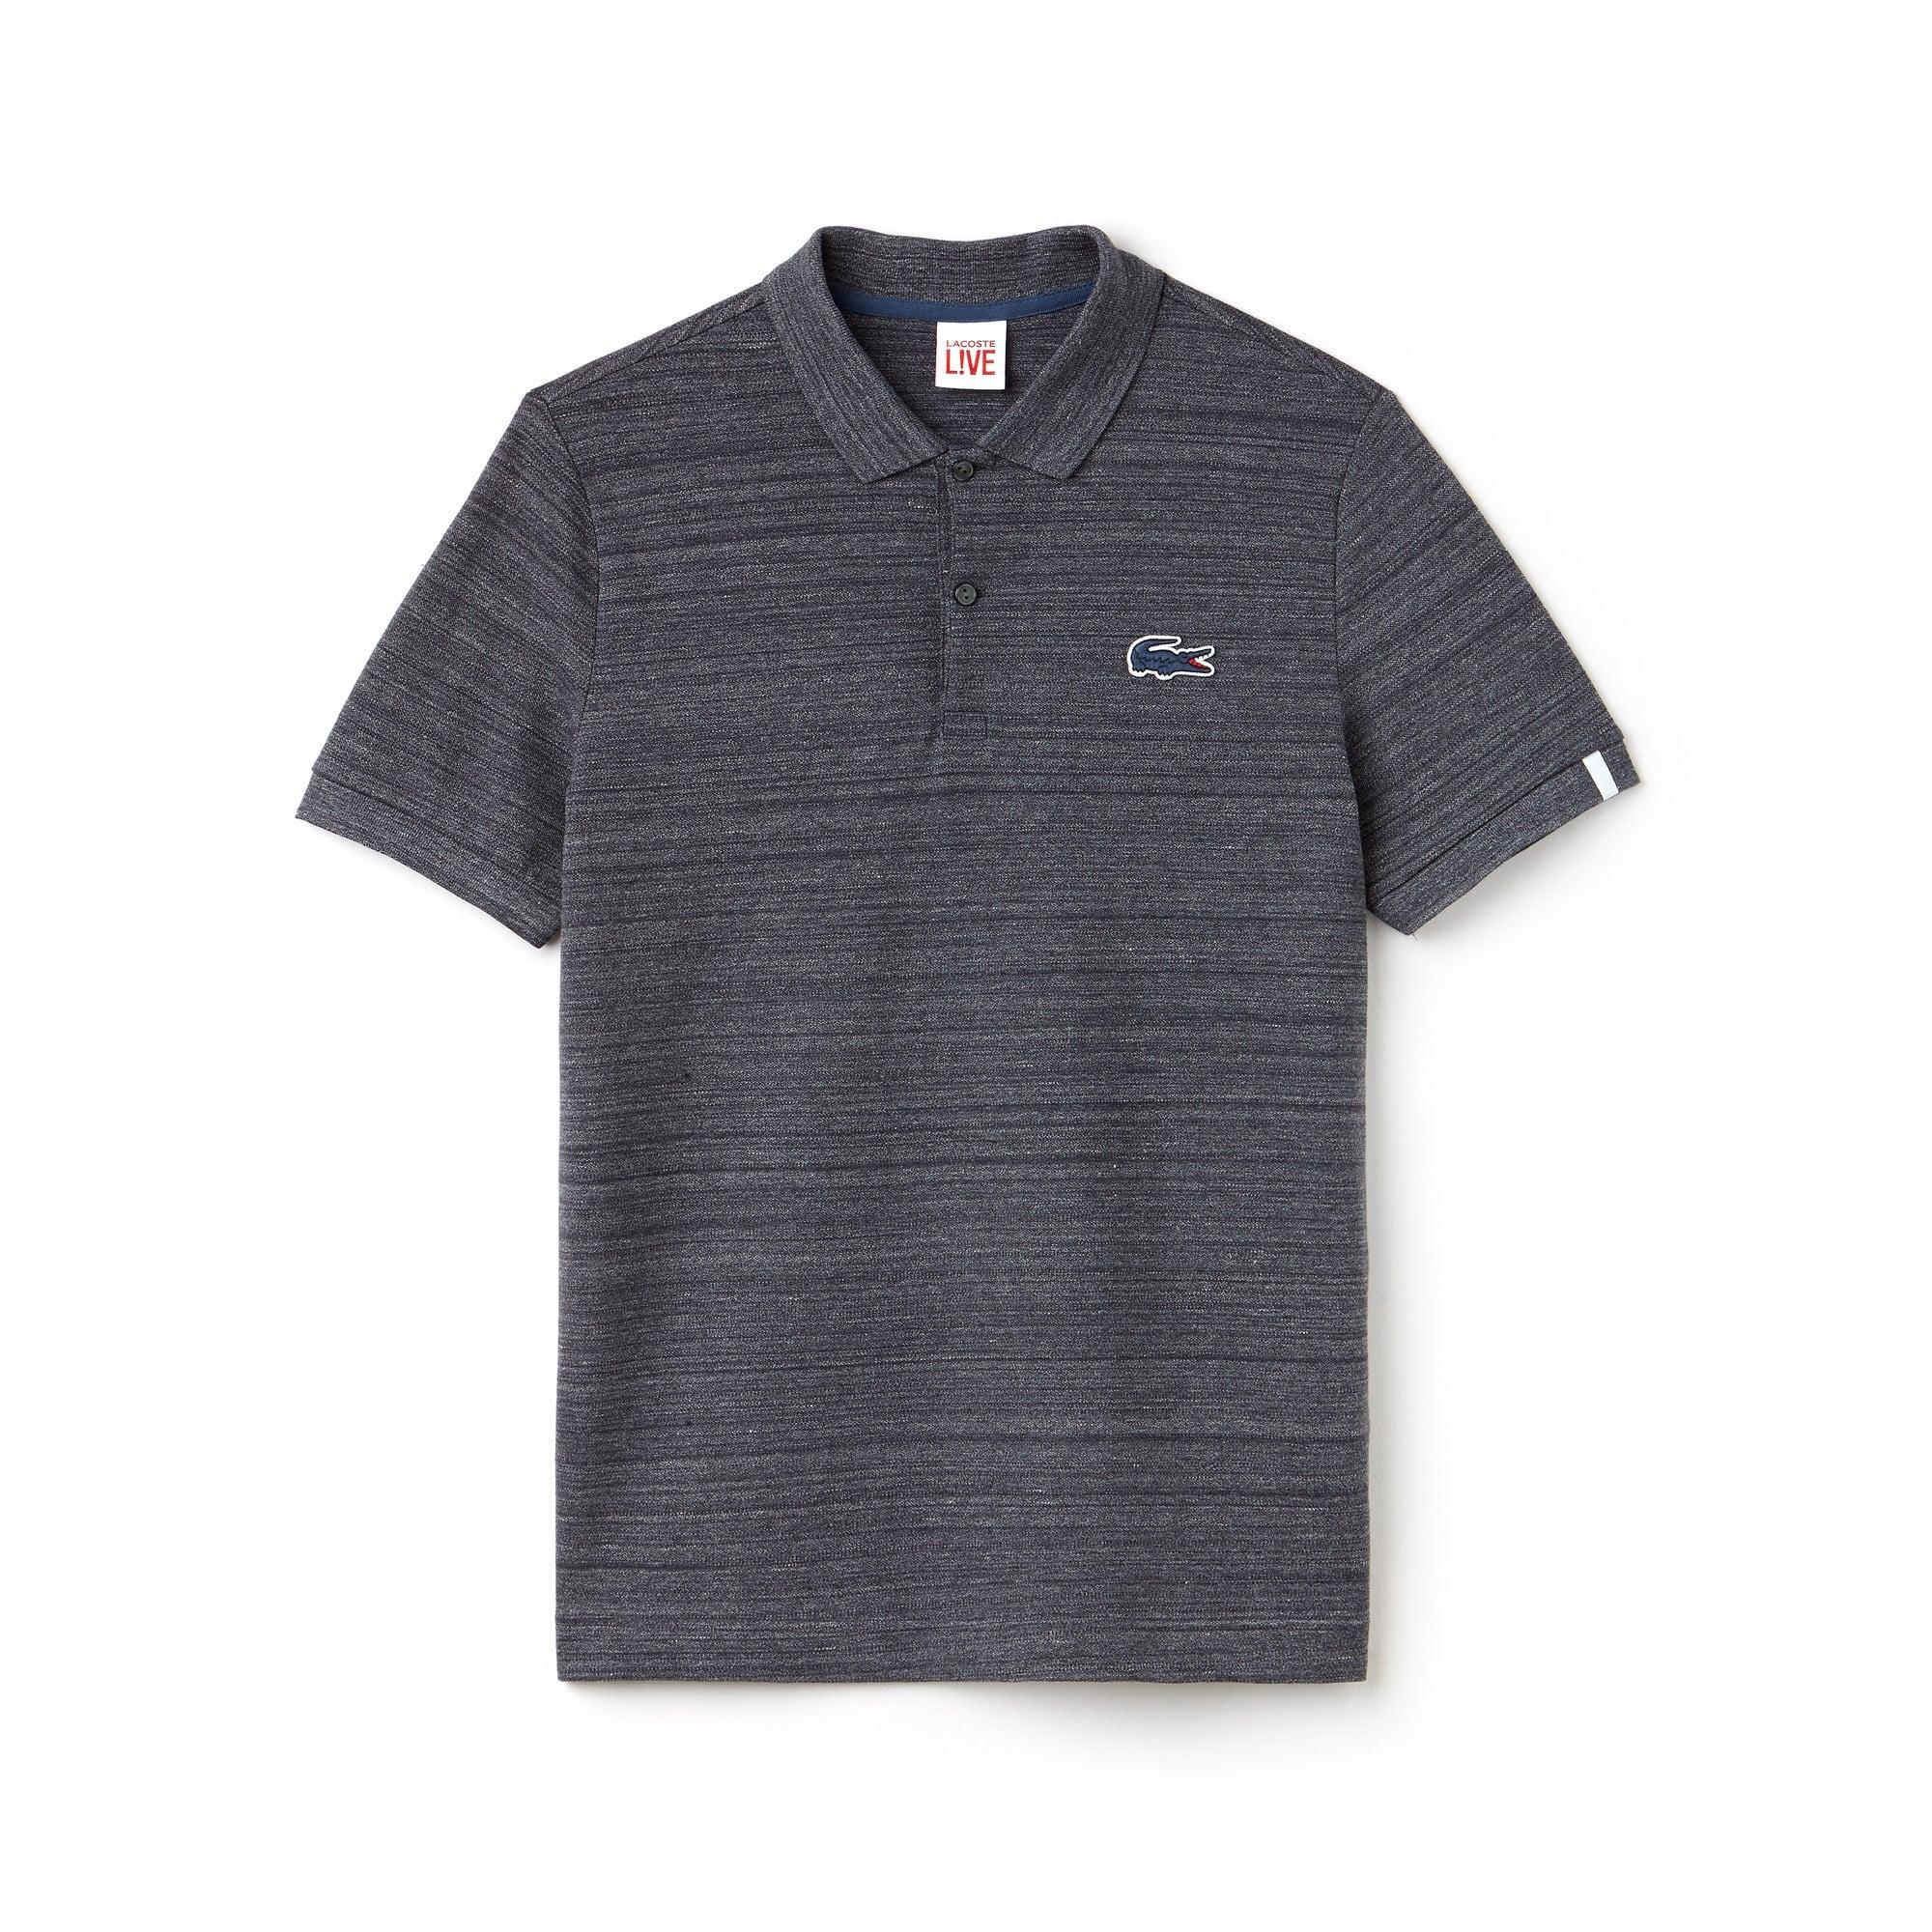 5a04dffe71b7e ... Men s Lacoste LIVE Slim Fit Stretch Mini Piqué Polo Shirt